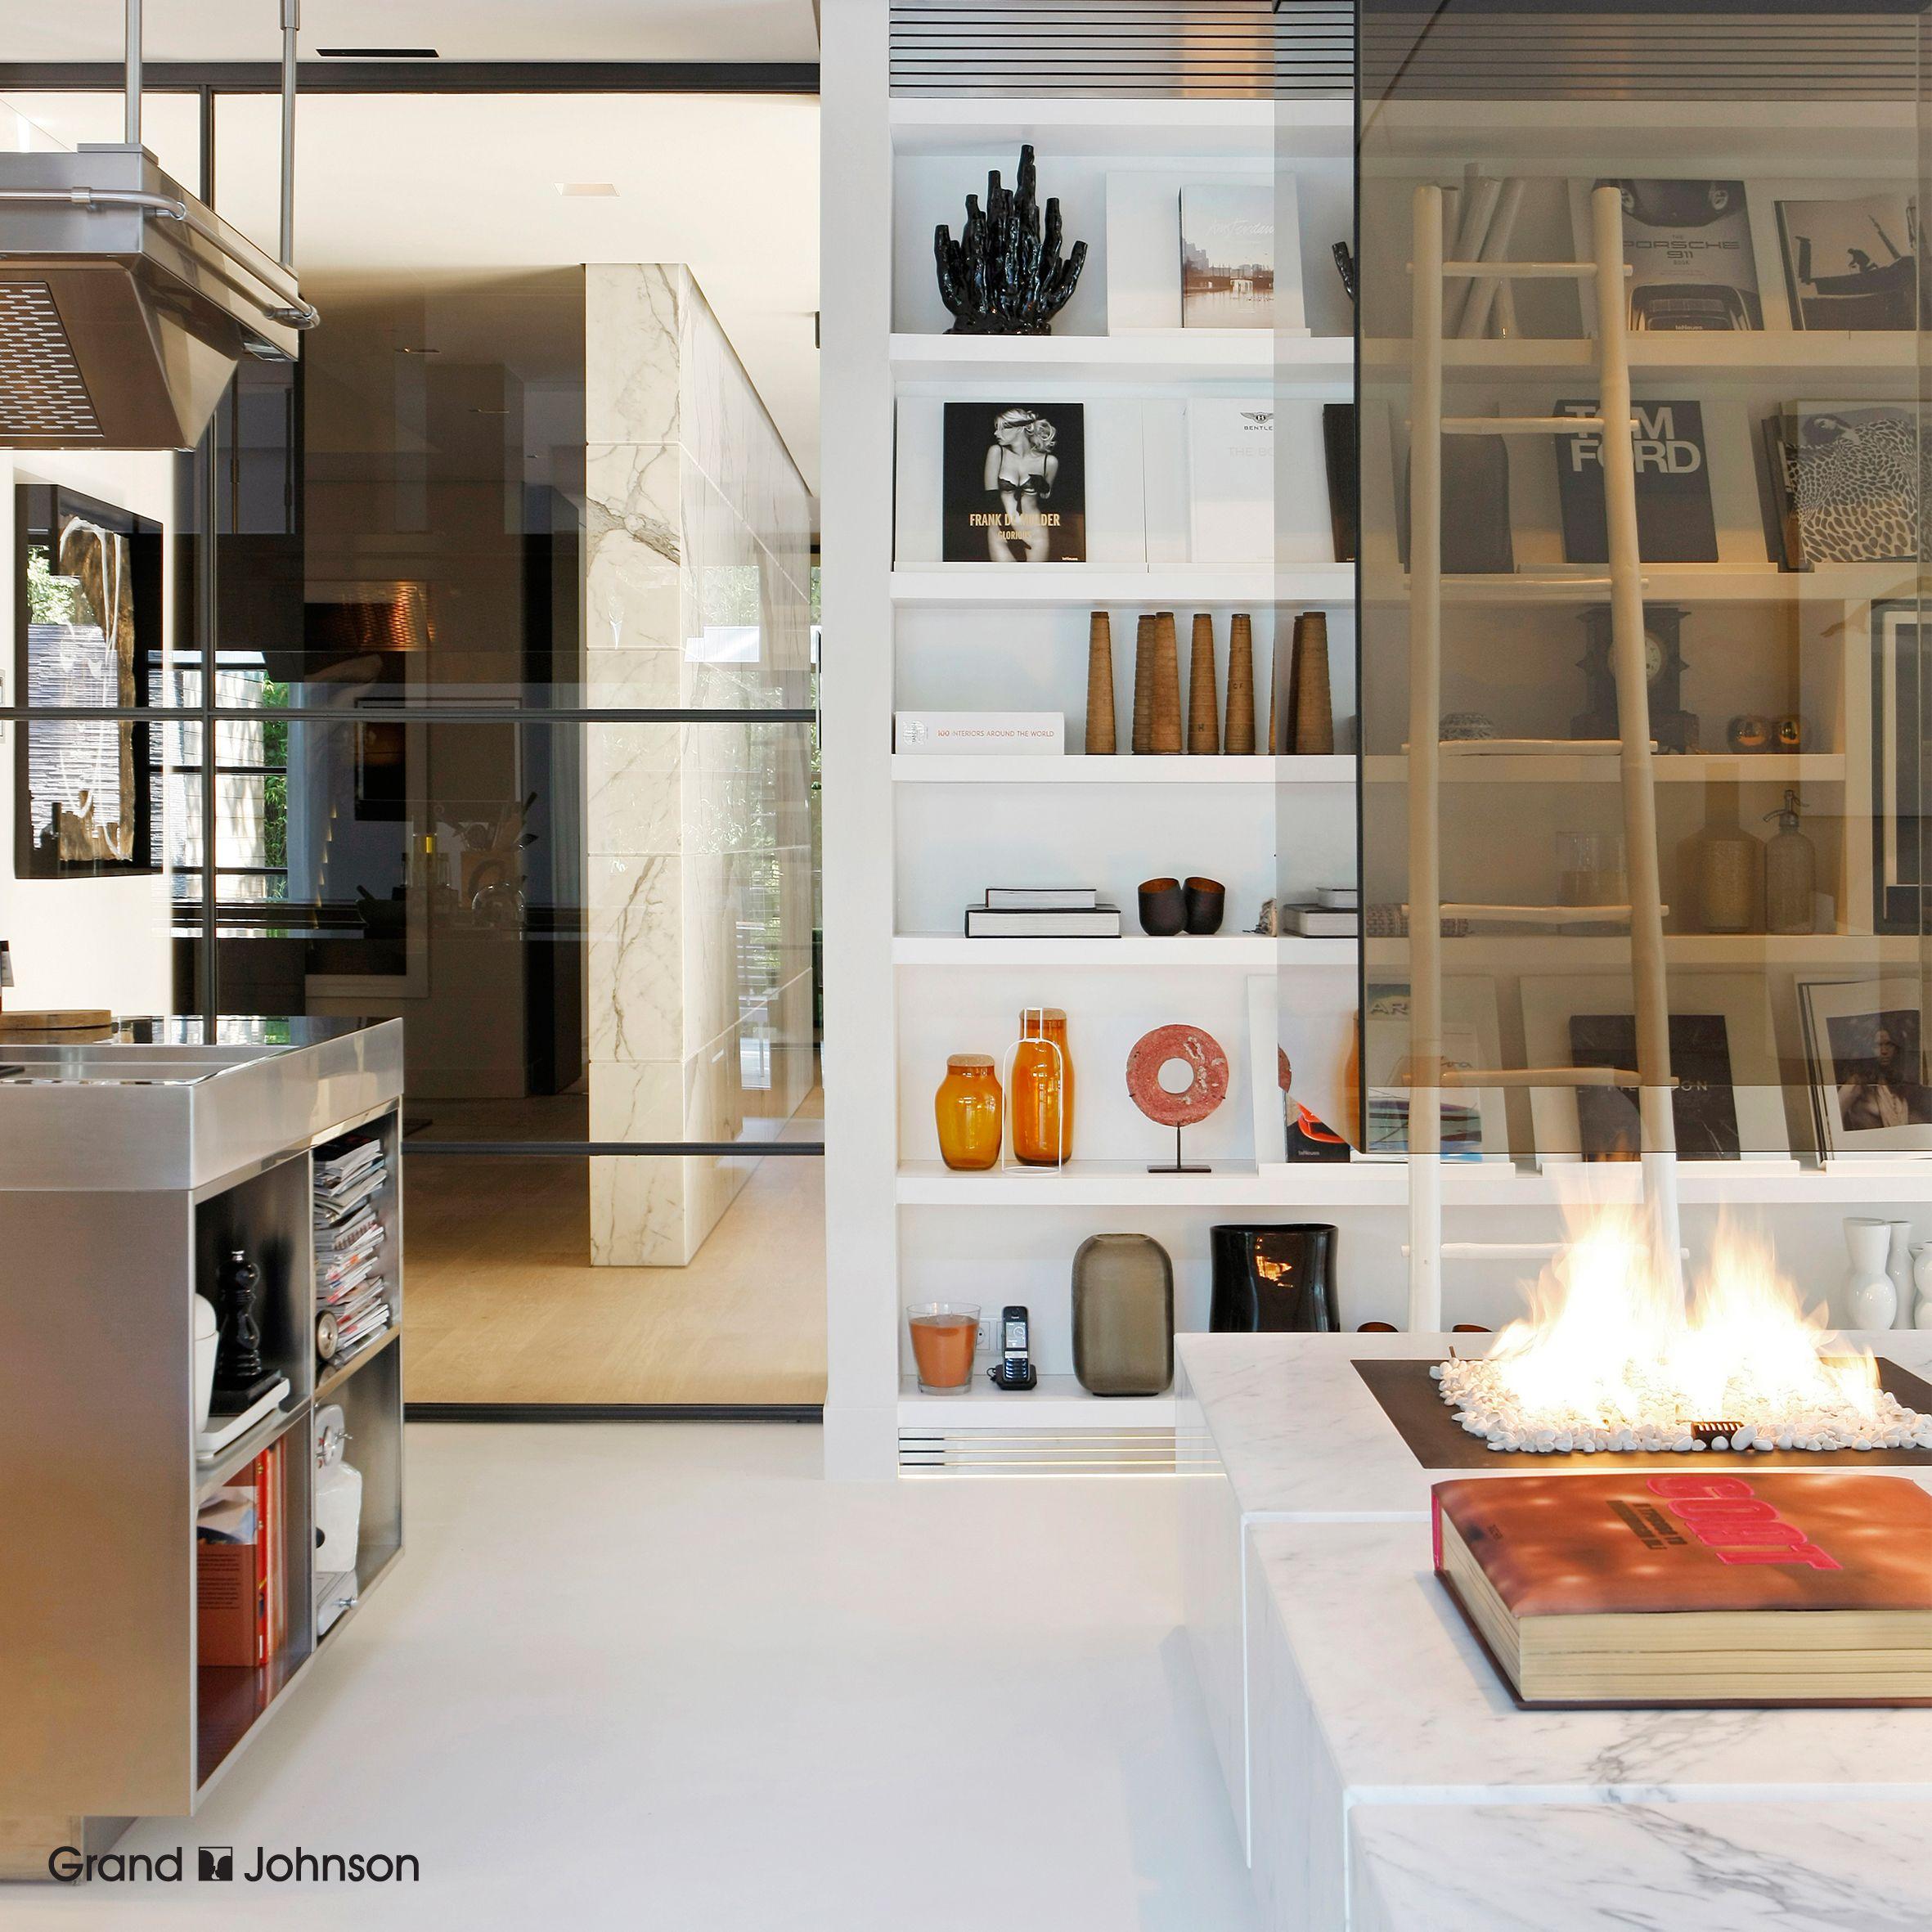 Residential design grand u johnson andjohnson